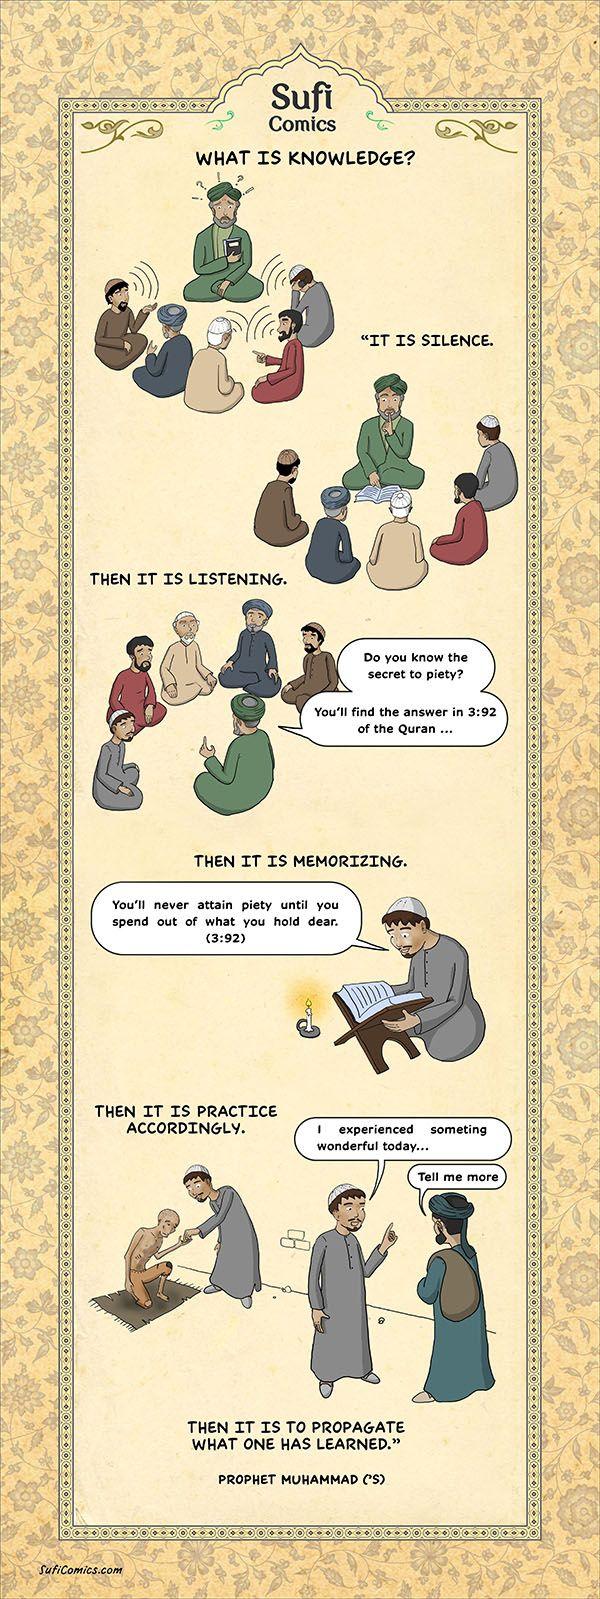 Sufi Comics - Comics for the Soul - Spiritual Islamic Comics